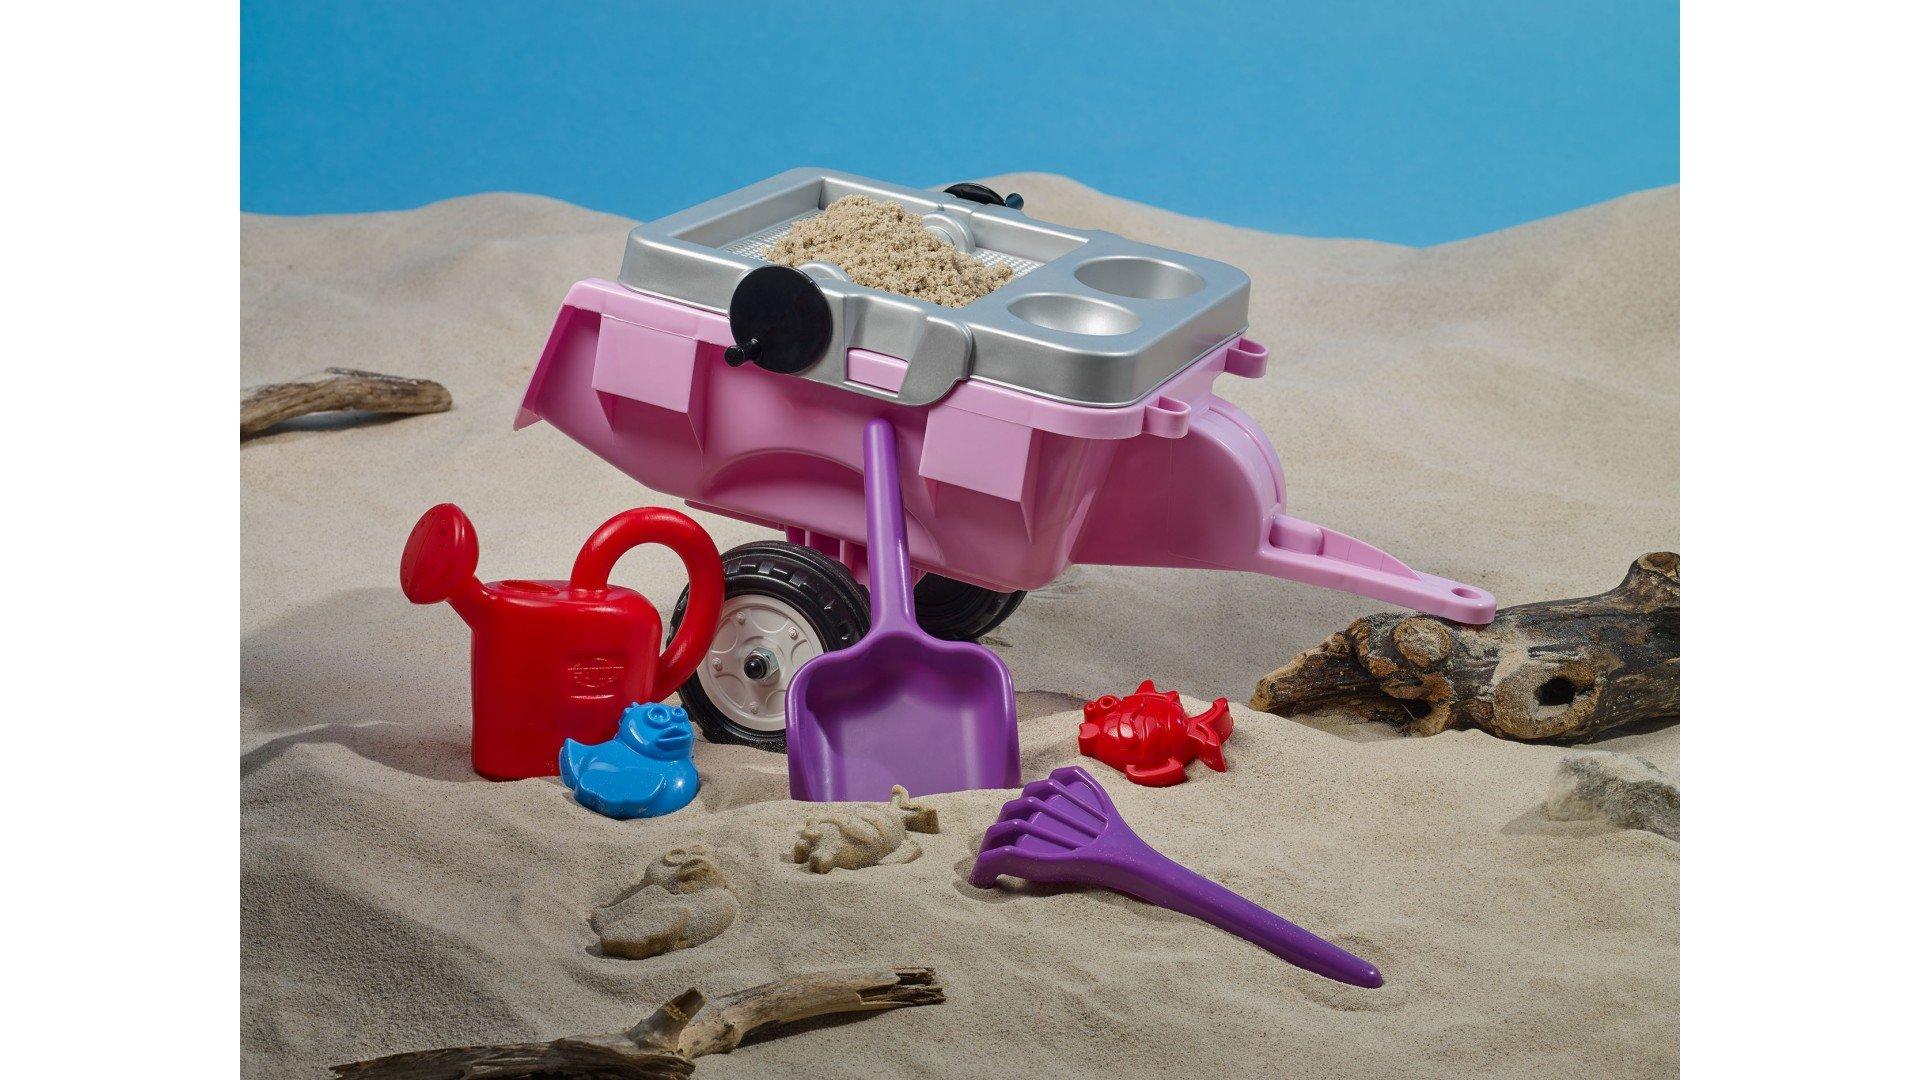 Detalle remolque con bandeja para jugar con arena (pala, rastrillo, regadera, moldes para arena)